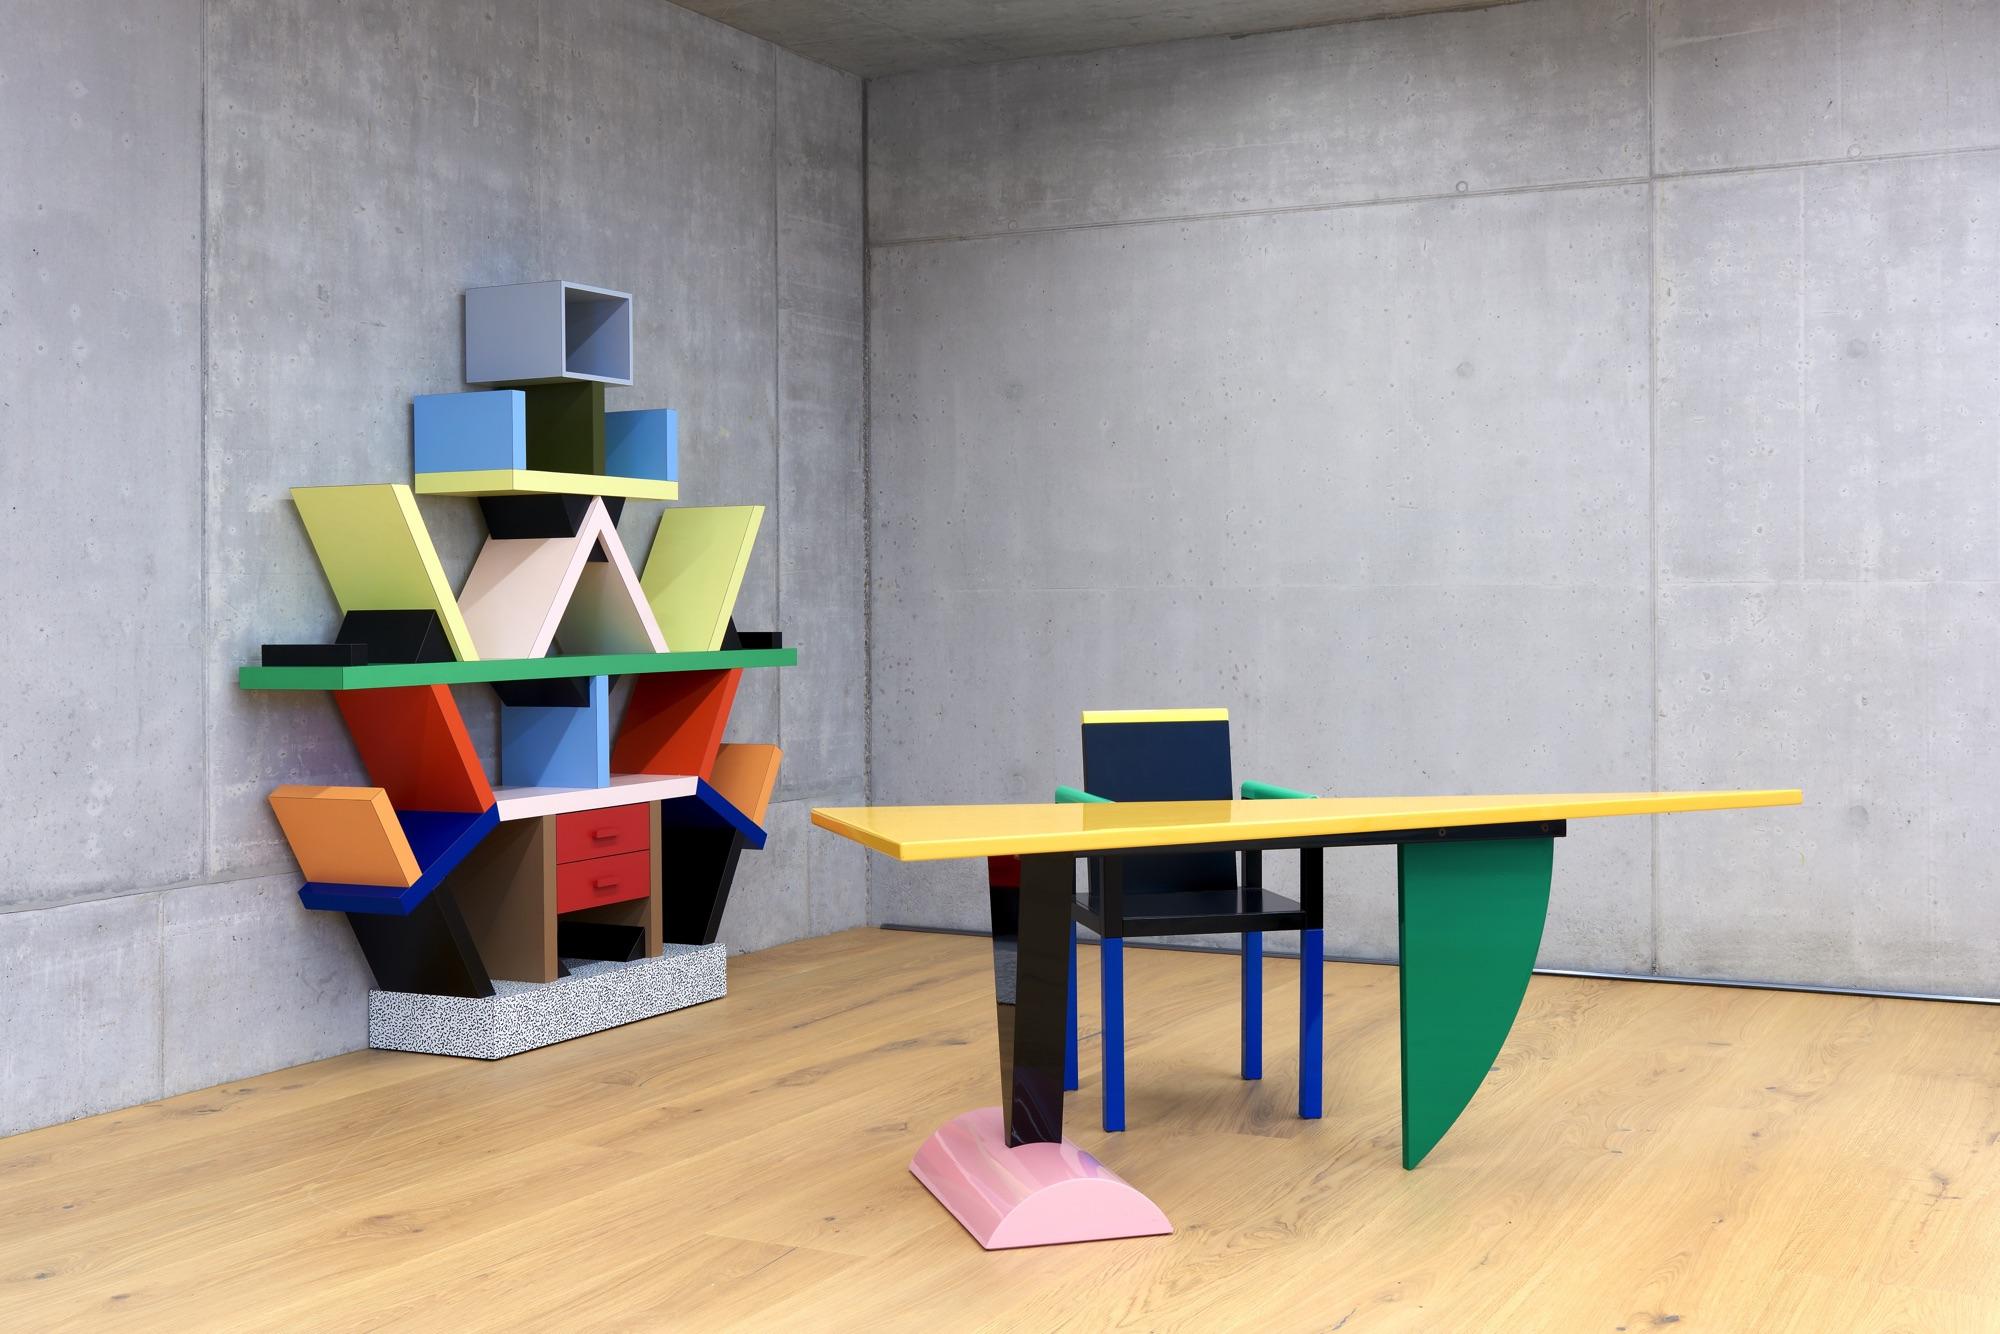 Grieder contemporary sottsass installation view 2 for Memphis sottsass